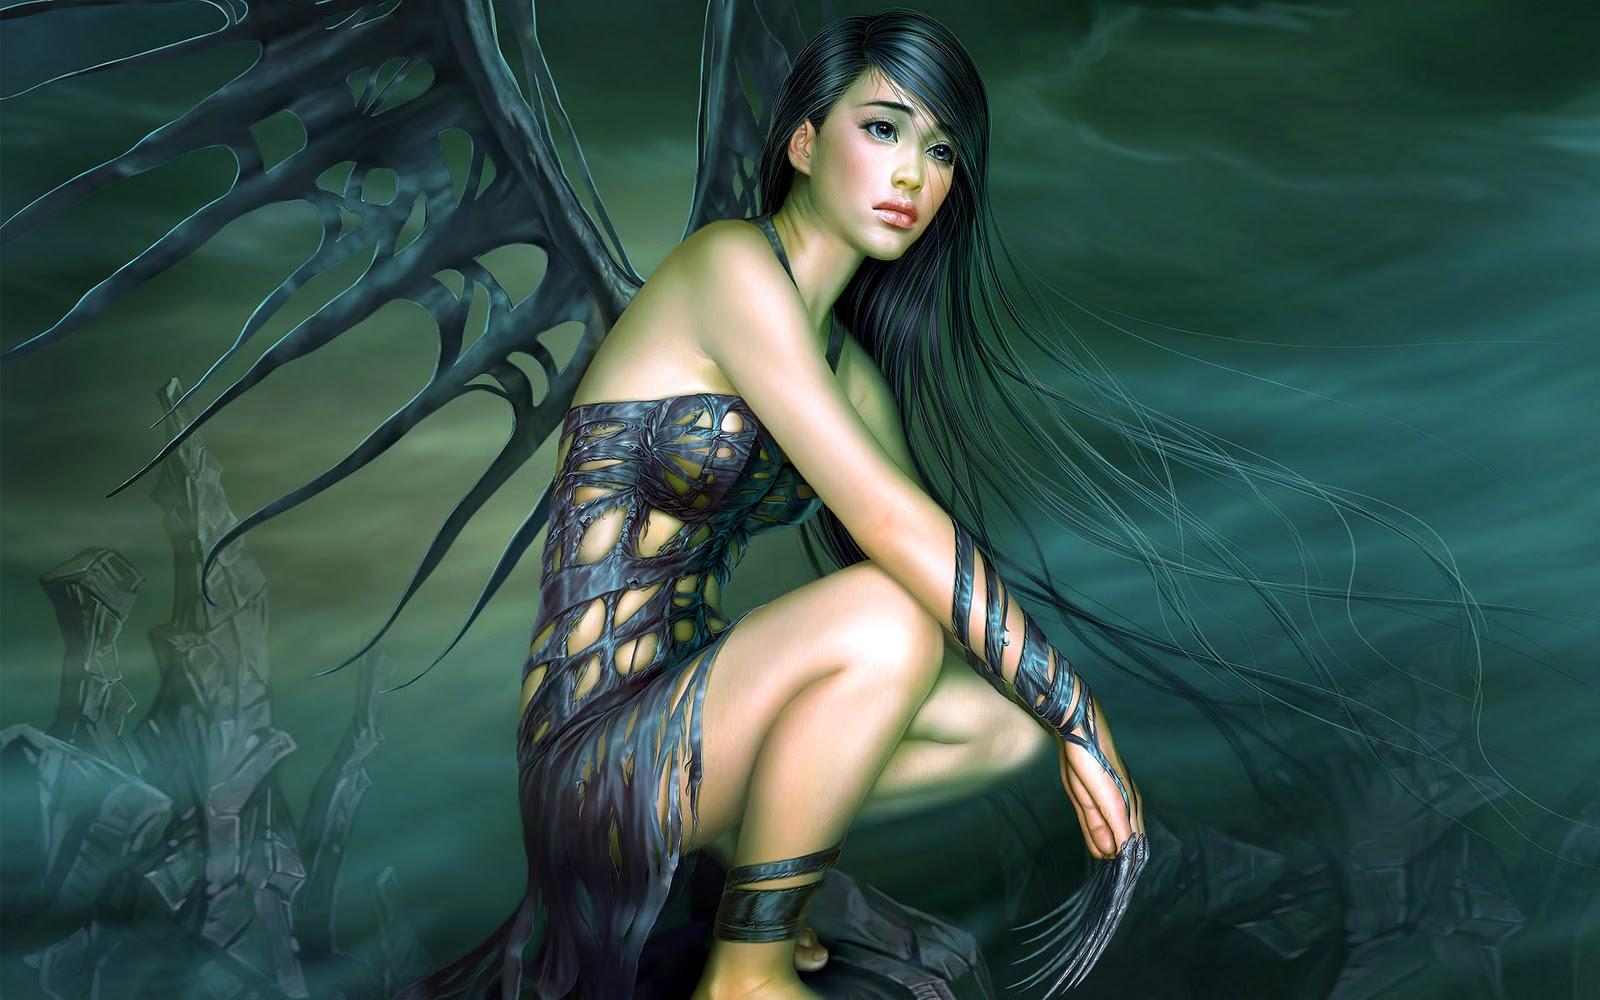 Bonewallpaper best desktop hd wallpapers angel photo - Angel girl wallpaper ...